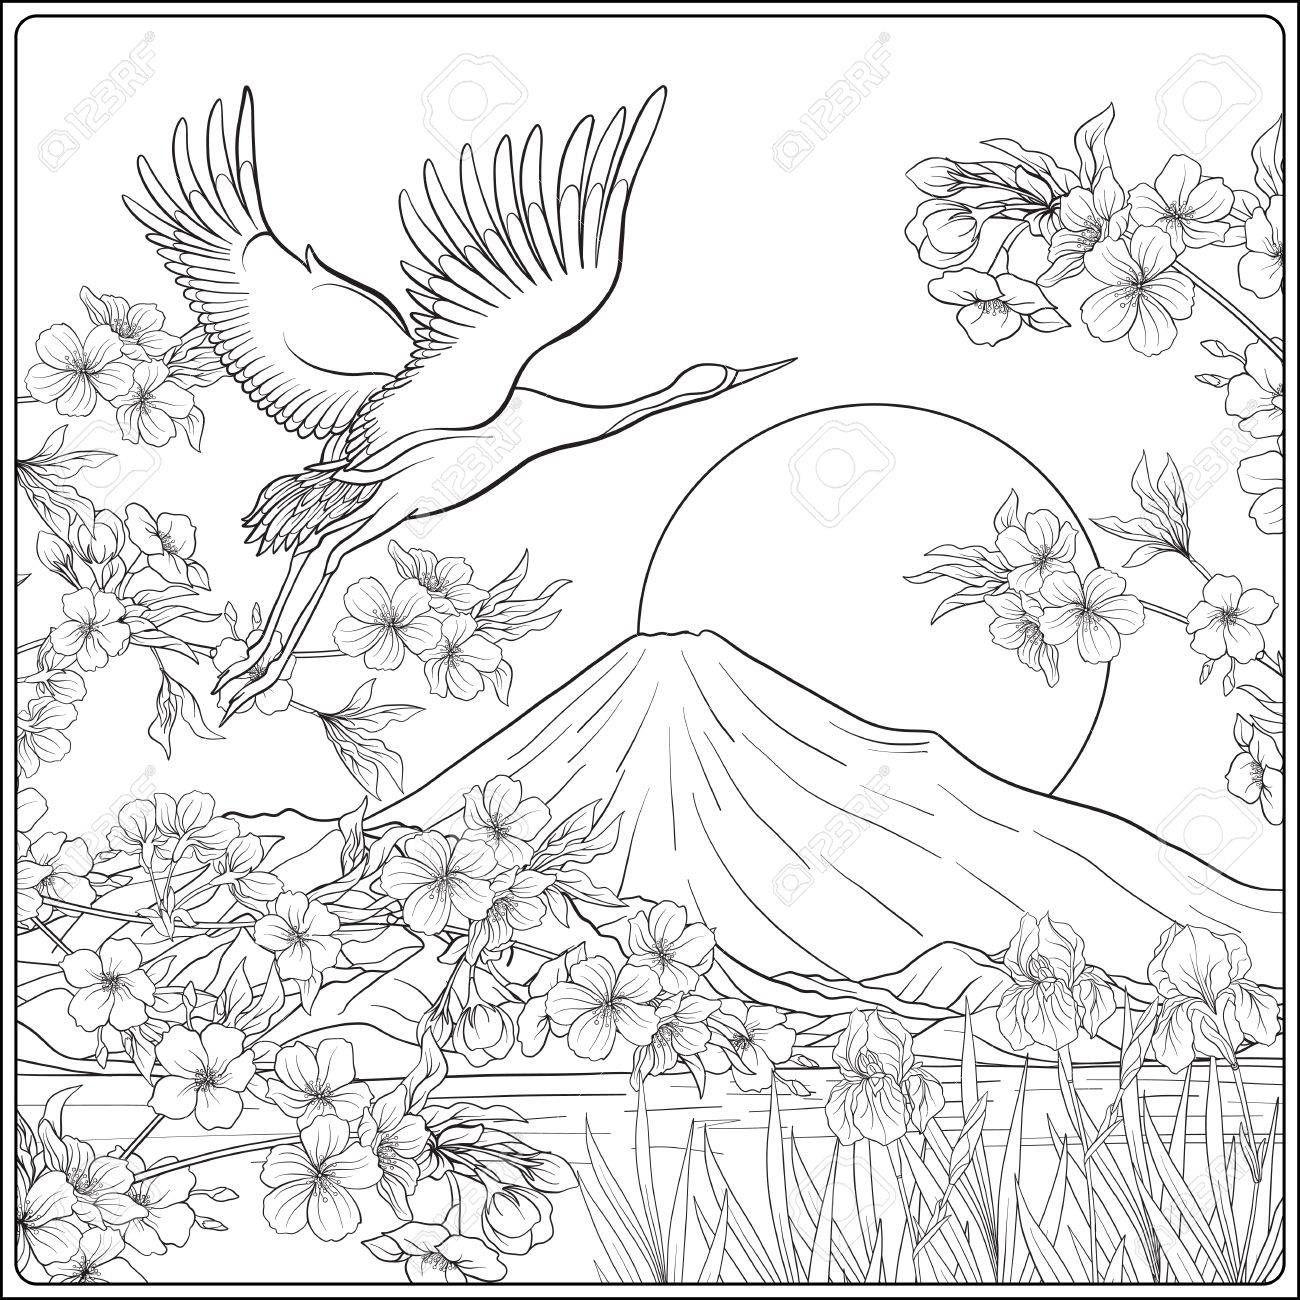 Dibujos Para Colorear De Paisajes Con Flores - Impresion ...